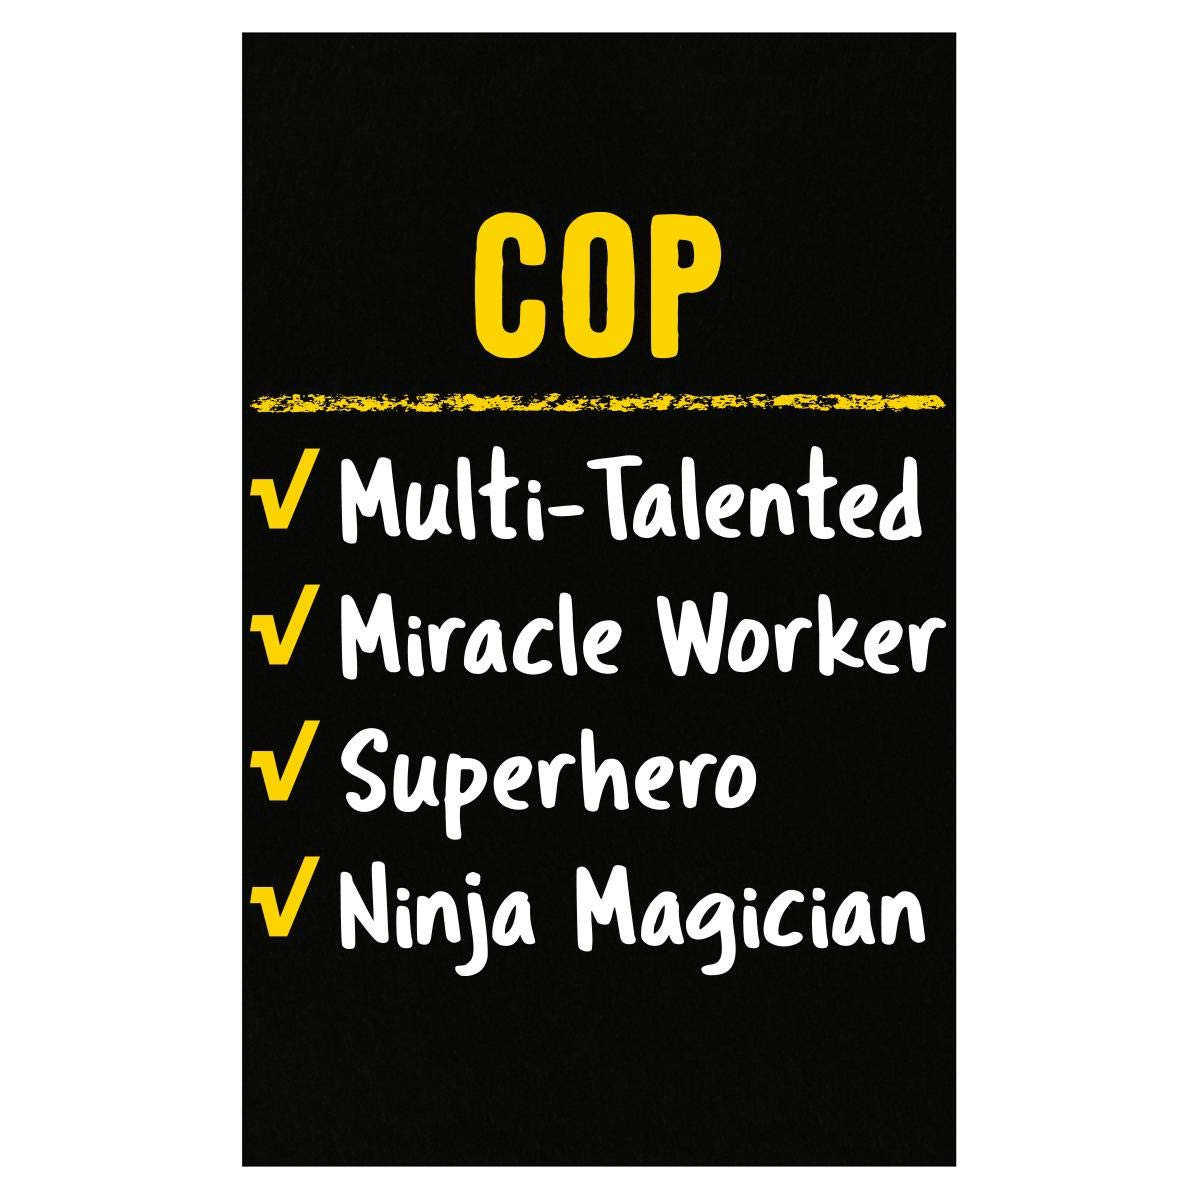 Amazon.com: Cop Talented Miracle Worker Superhero Ninja ...